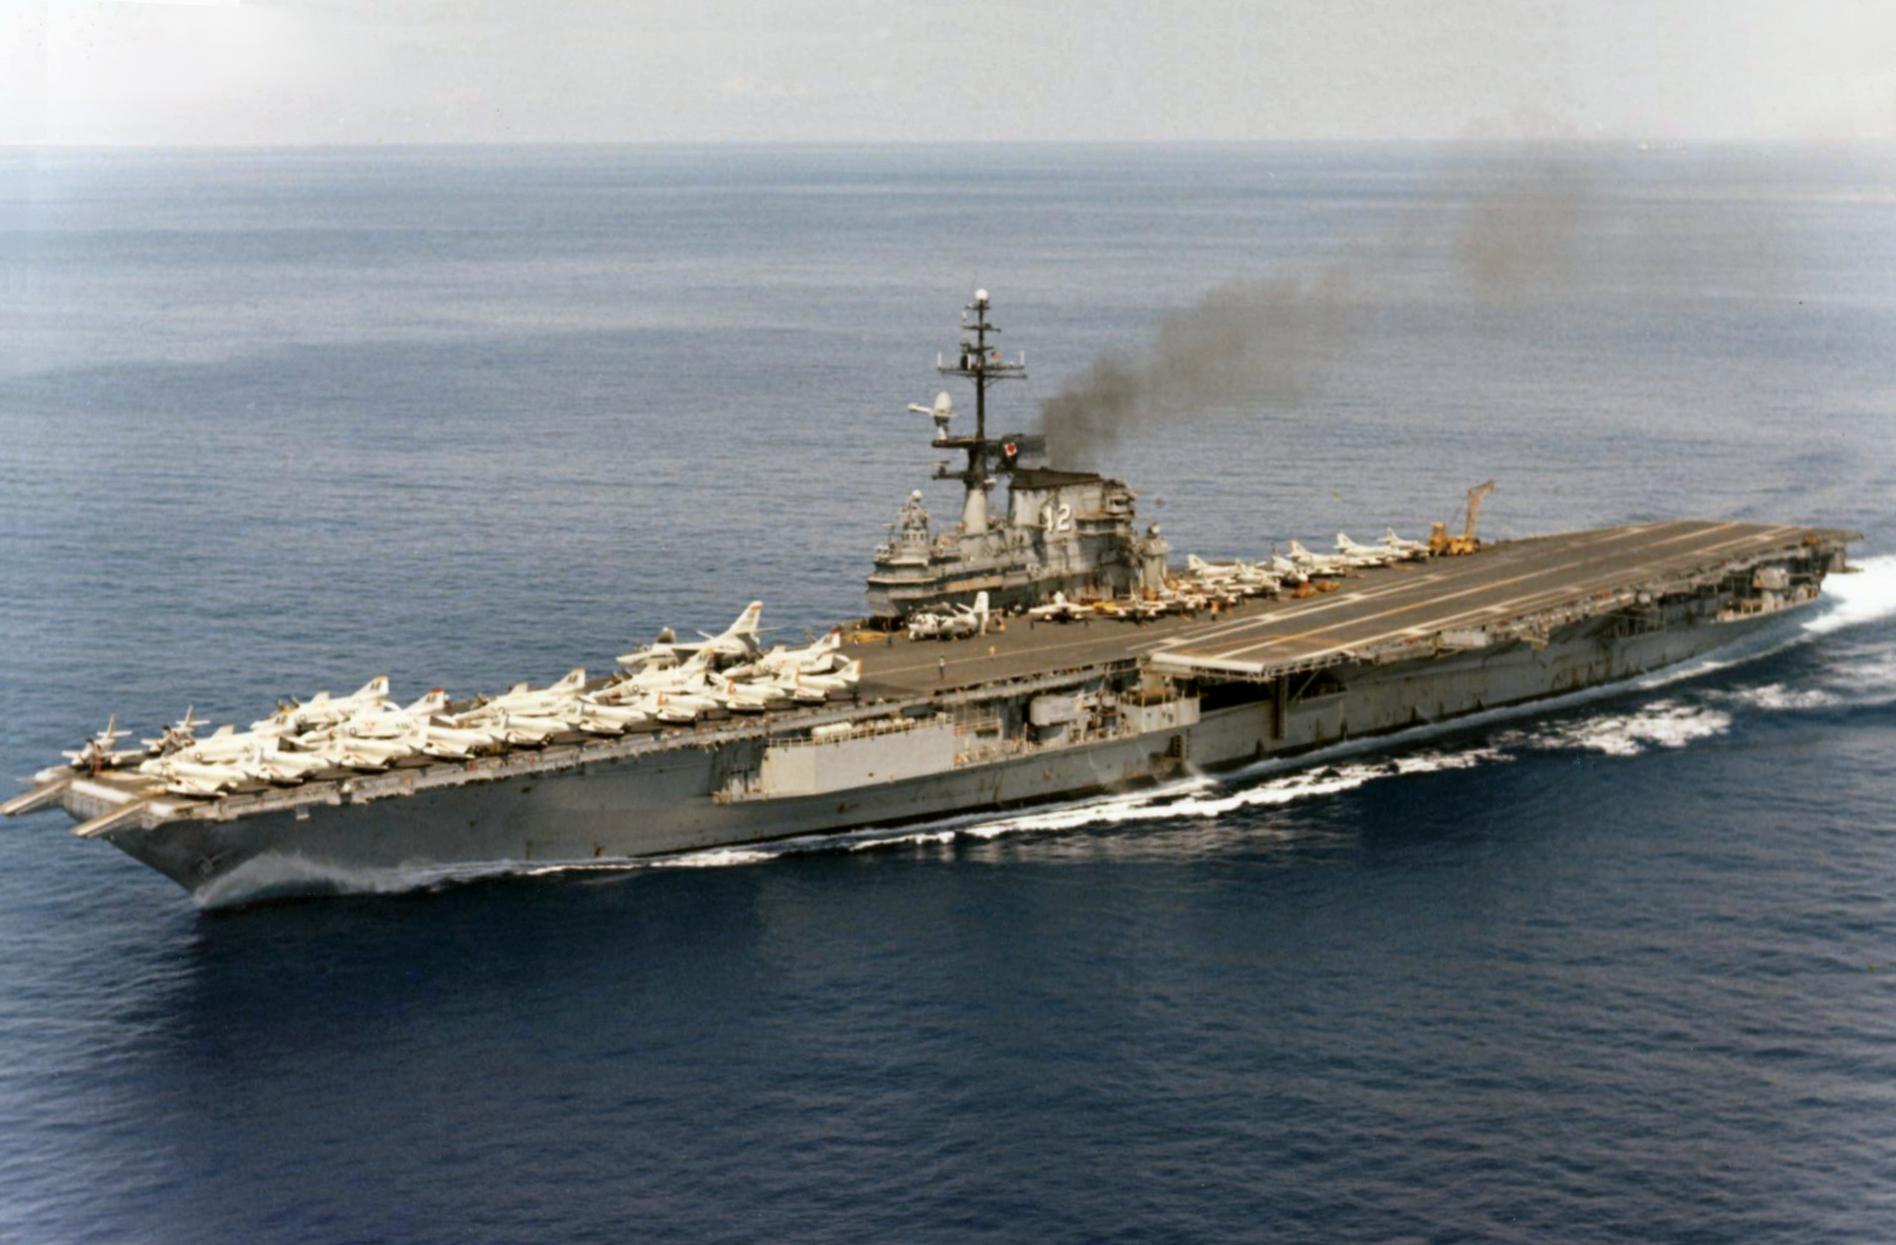 Uss Franklin Roosevelt Cva 42 Med Deployment Cruise Book